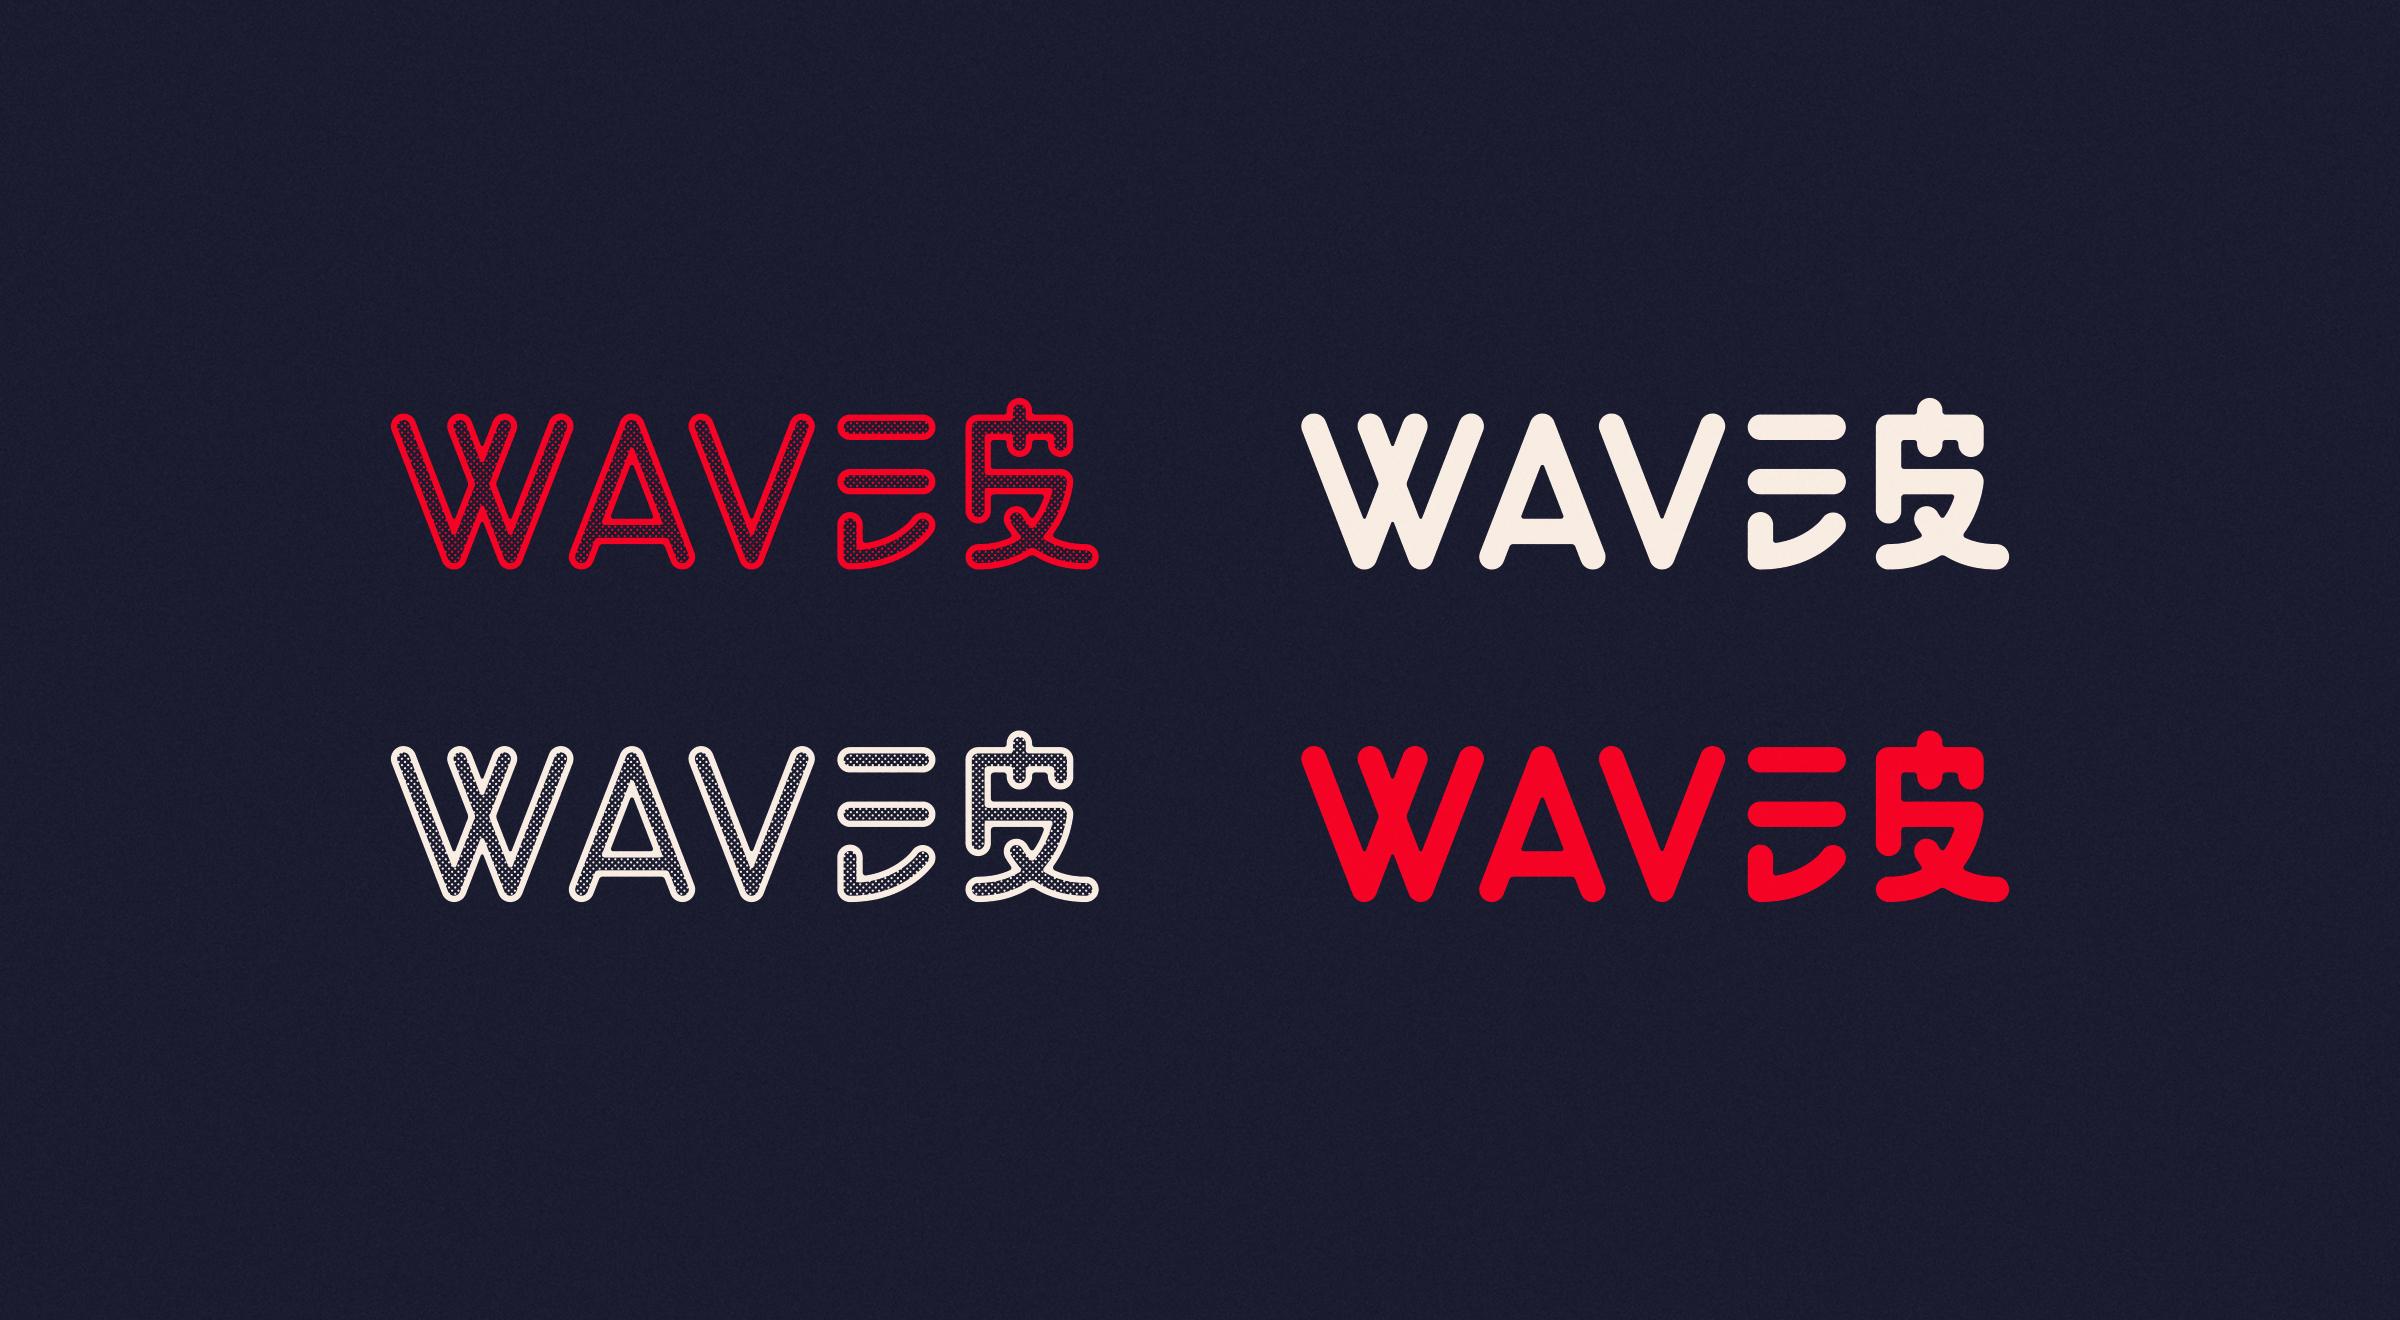 TBS_Waves_Wordmark_1